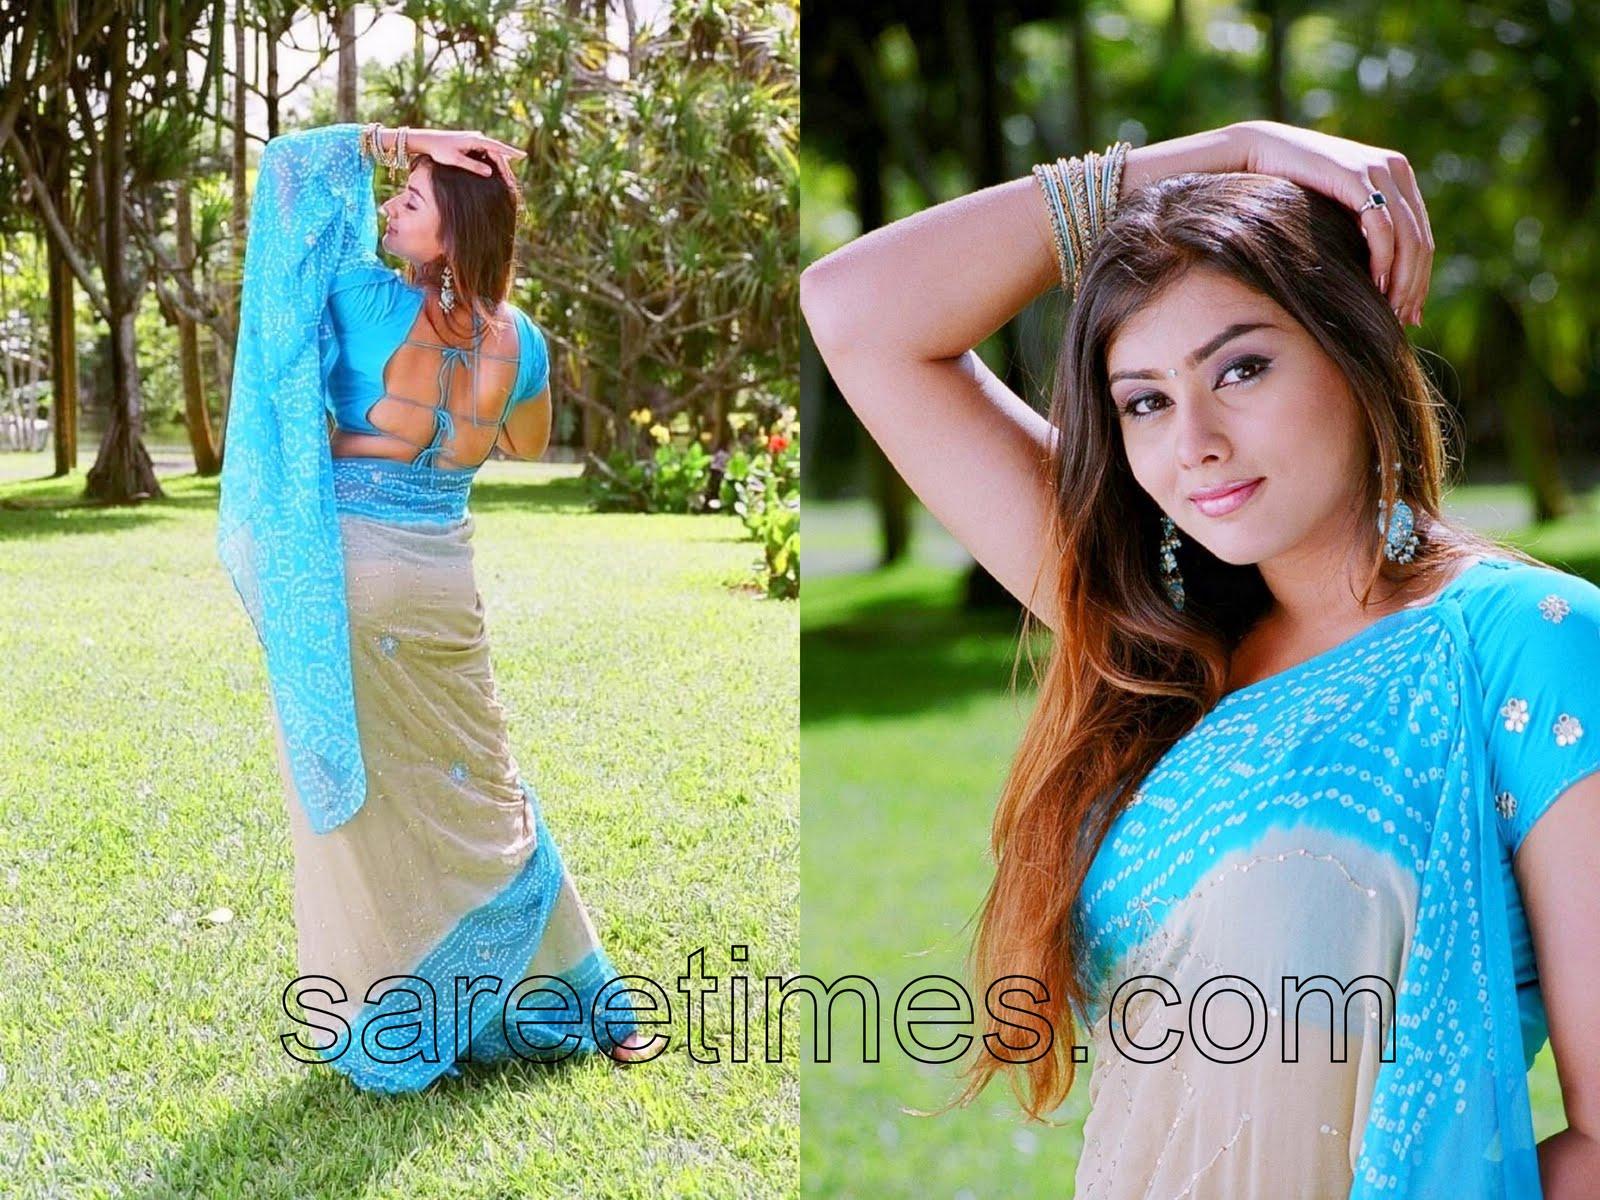 http://1.bp.blogspot.com/_58_qEOwiSDY/TDY2J0MRrYI/AAAAAAAADRI/kuQu1GjVJ_E/s1600/Namitha-Bhandhini-Saree.jpg